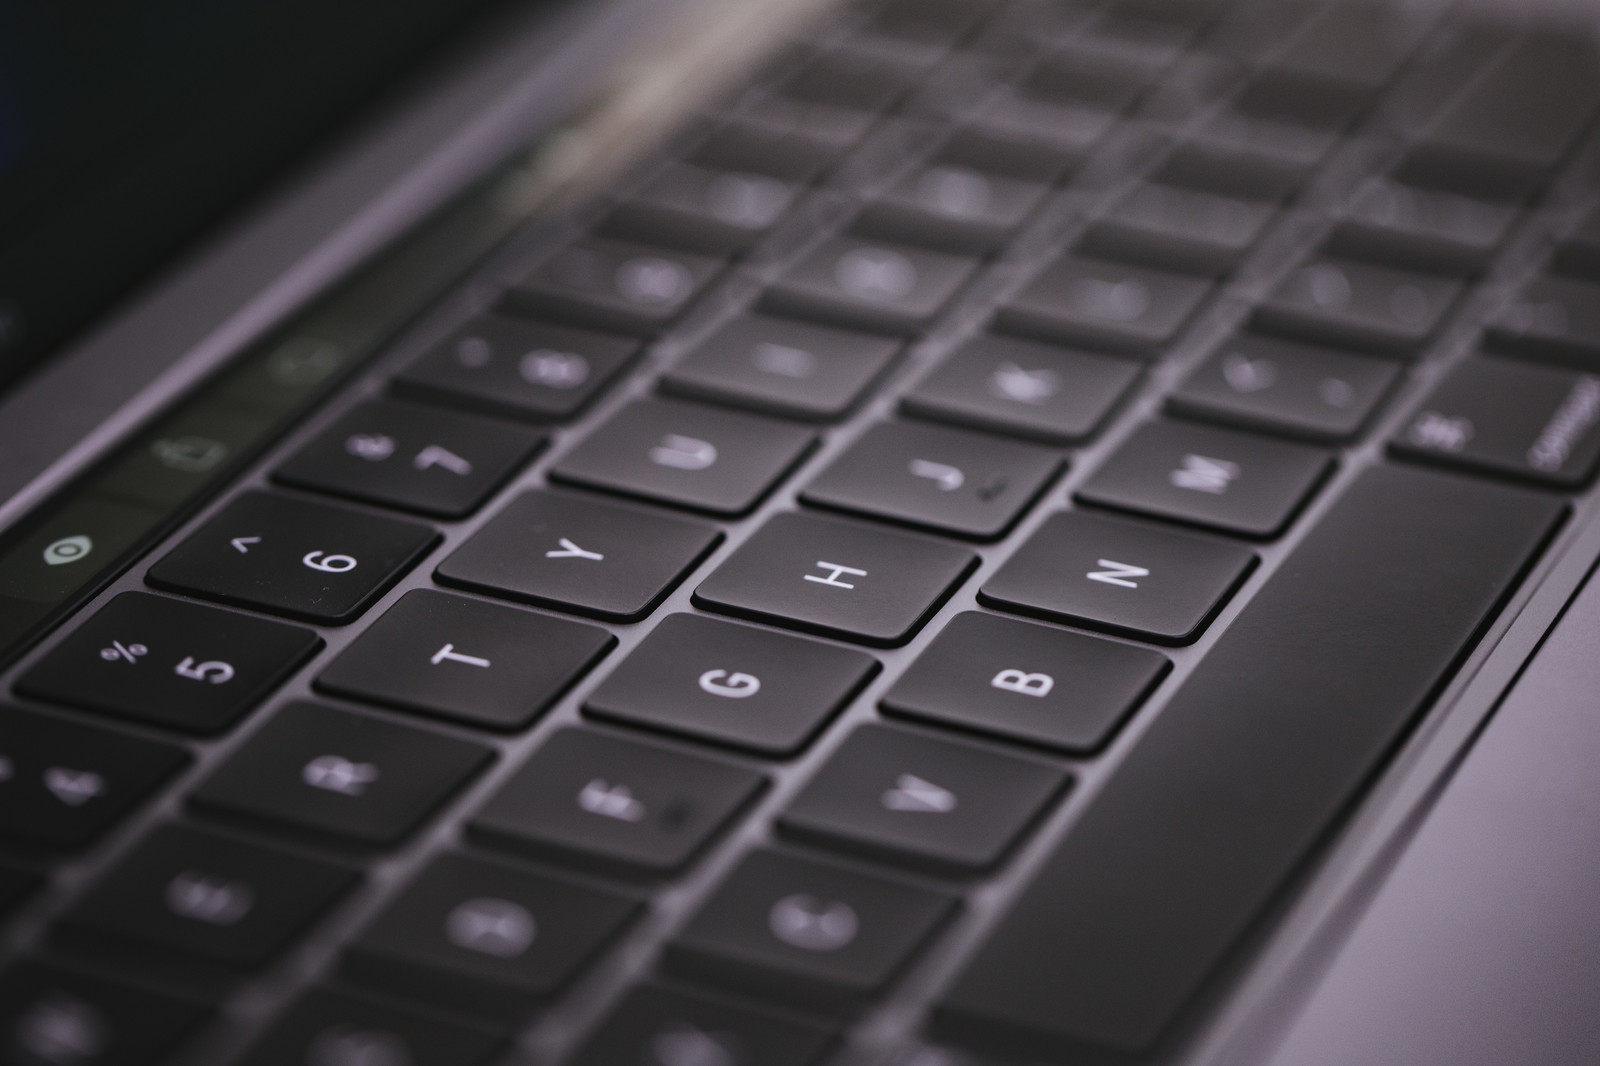 「MacBook Pro 2018 の第3世代バタフライ式キーボードMacBook Pro 2018 の第3世代バタフライ式キーボード」のフリー写真素材を拡大